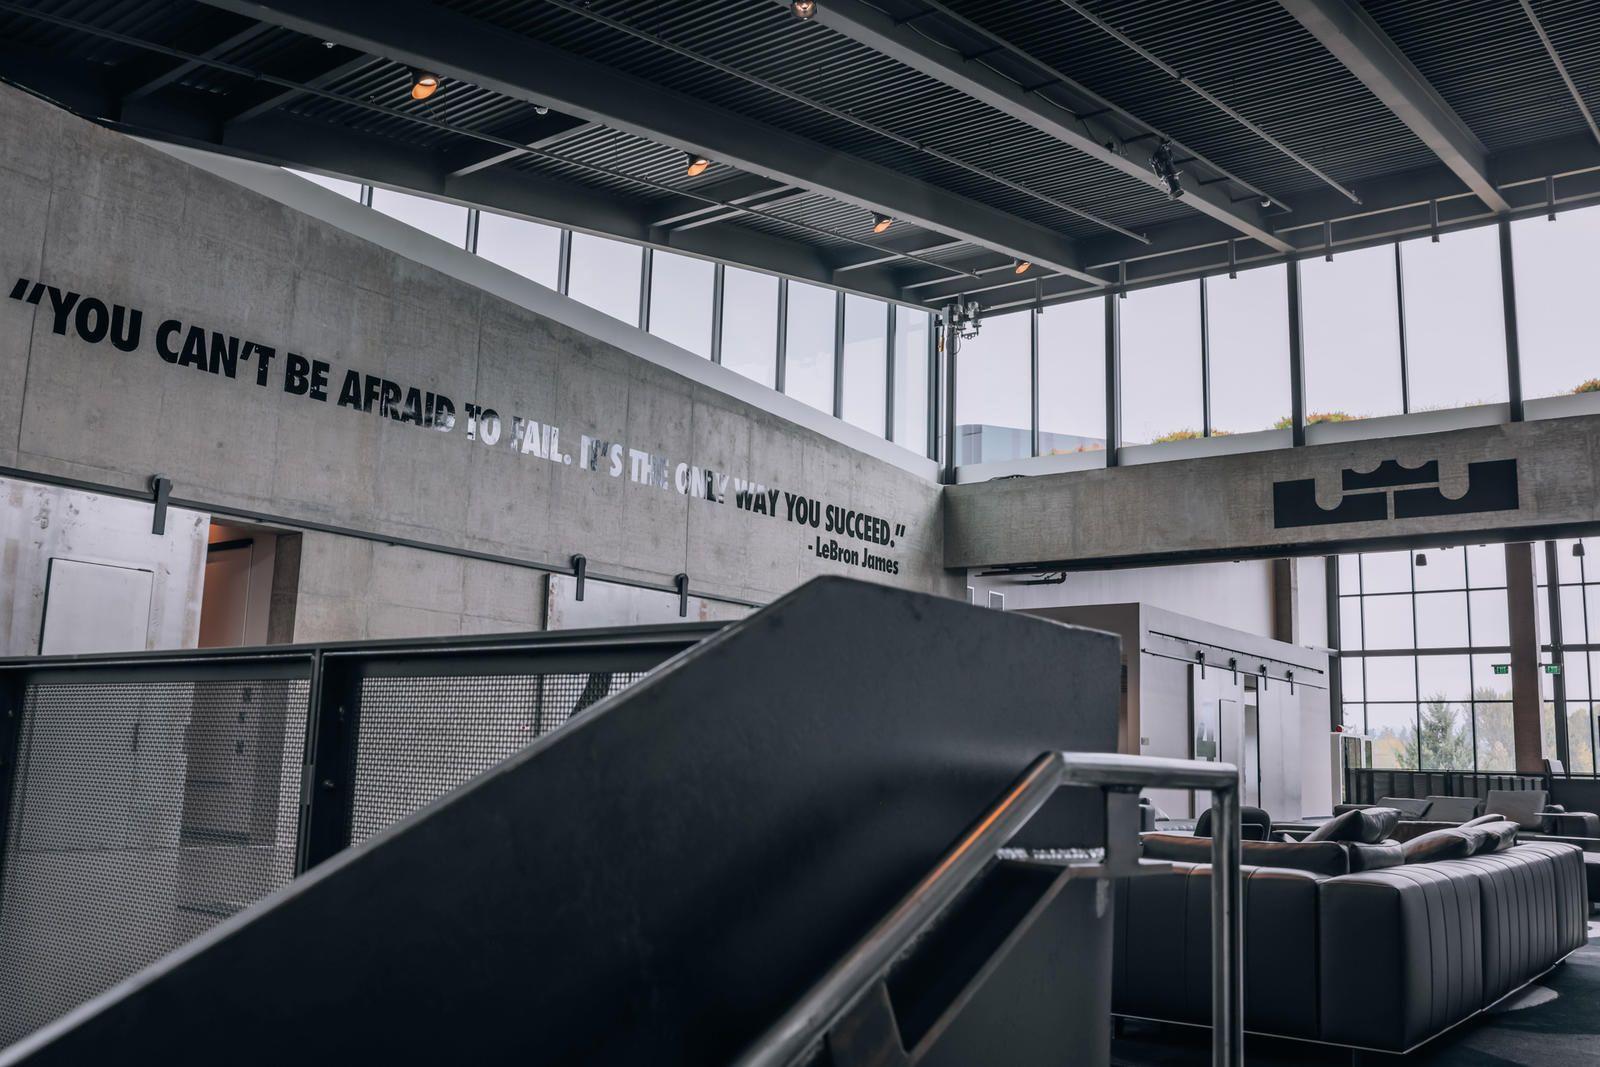 LeBron James Innovation Center at Nike's World Headquarters